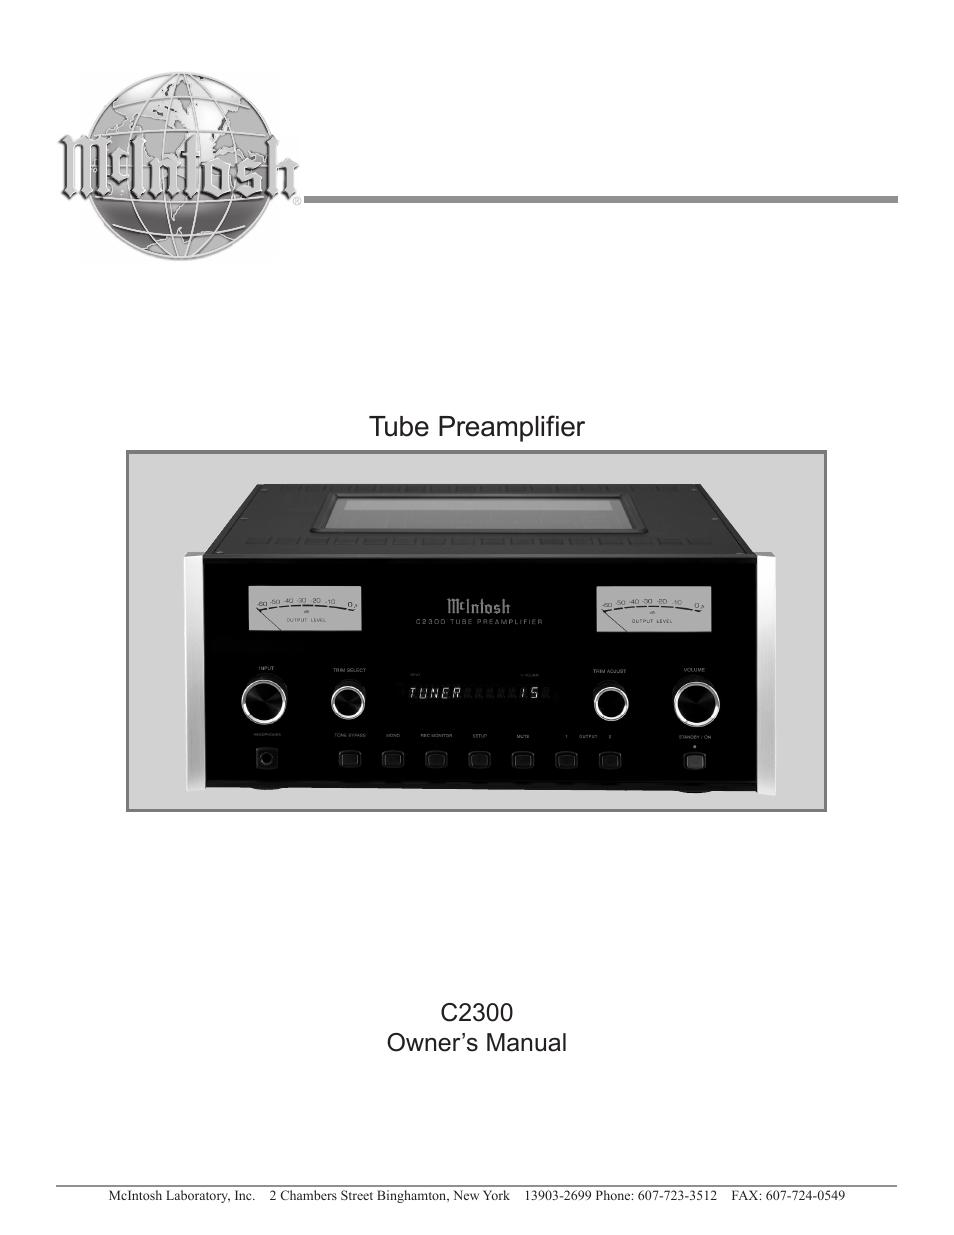 mcintosh c2300 user manual 24 pages rh manualsdir com mcintosh c500 owner's manual mcintosh ma6900 owners manual